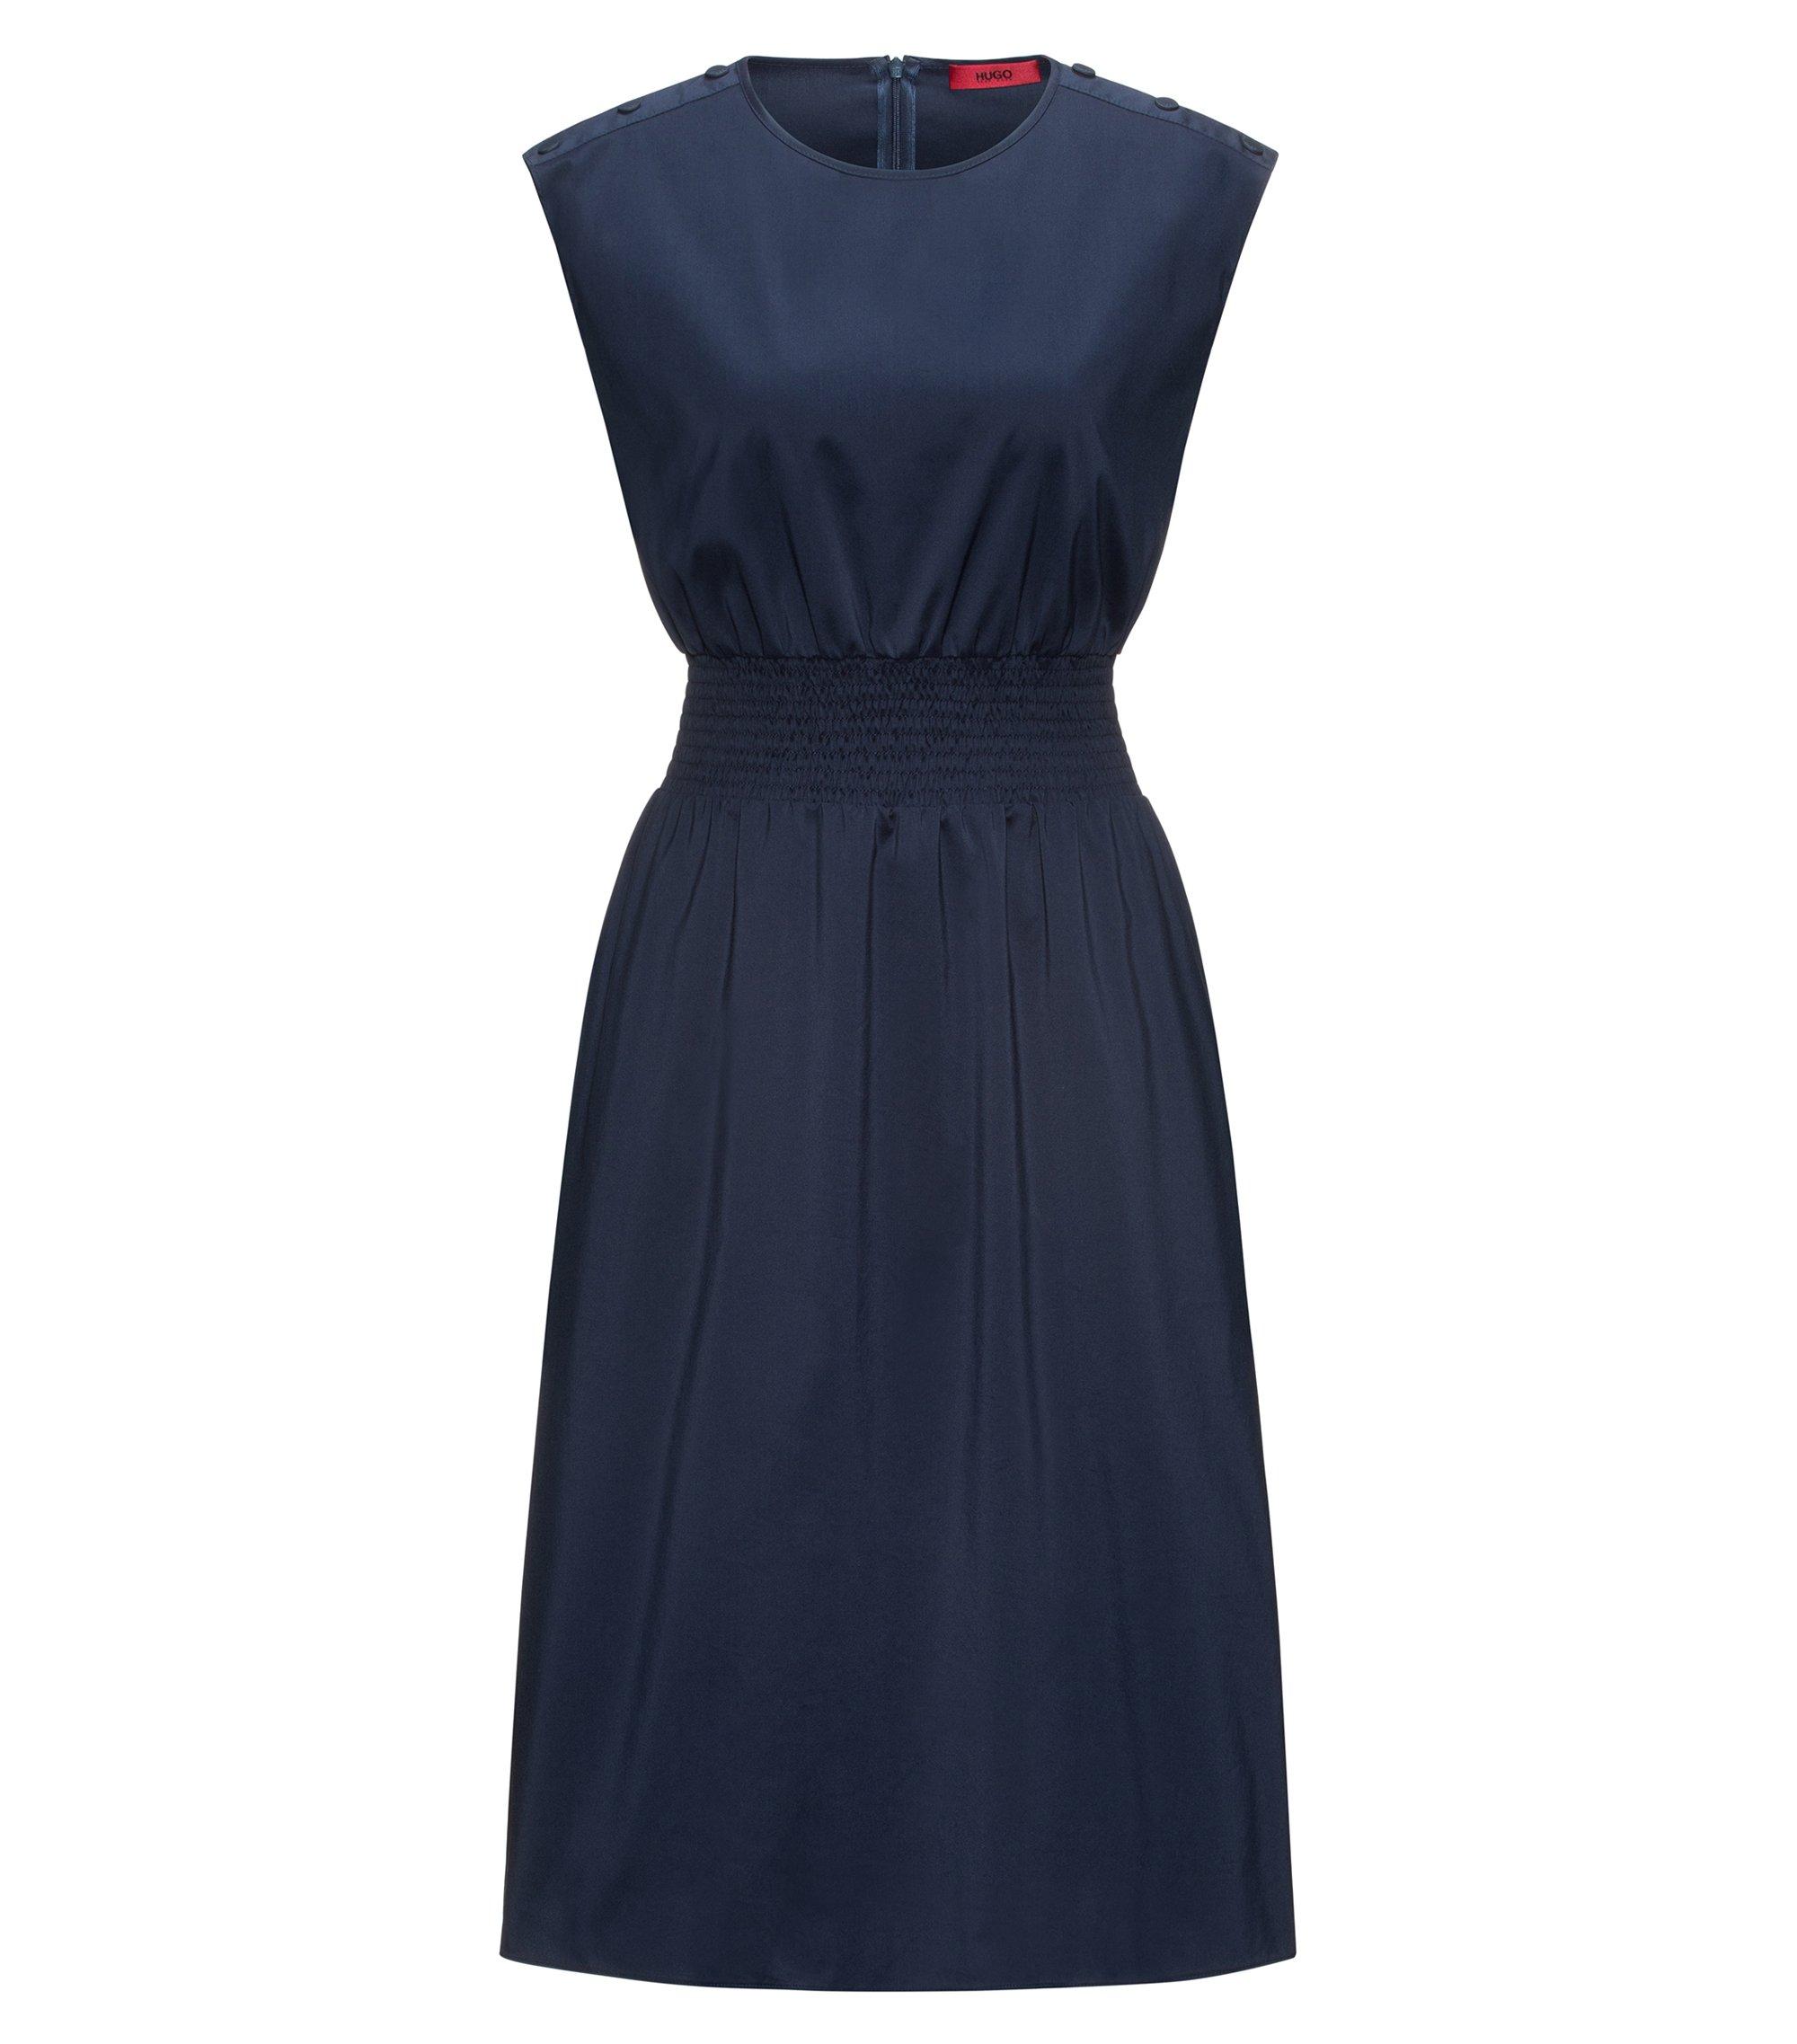 Cotton-blend sleeveless dress with smocking detail, Dark Blue